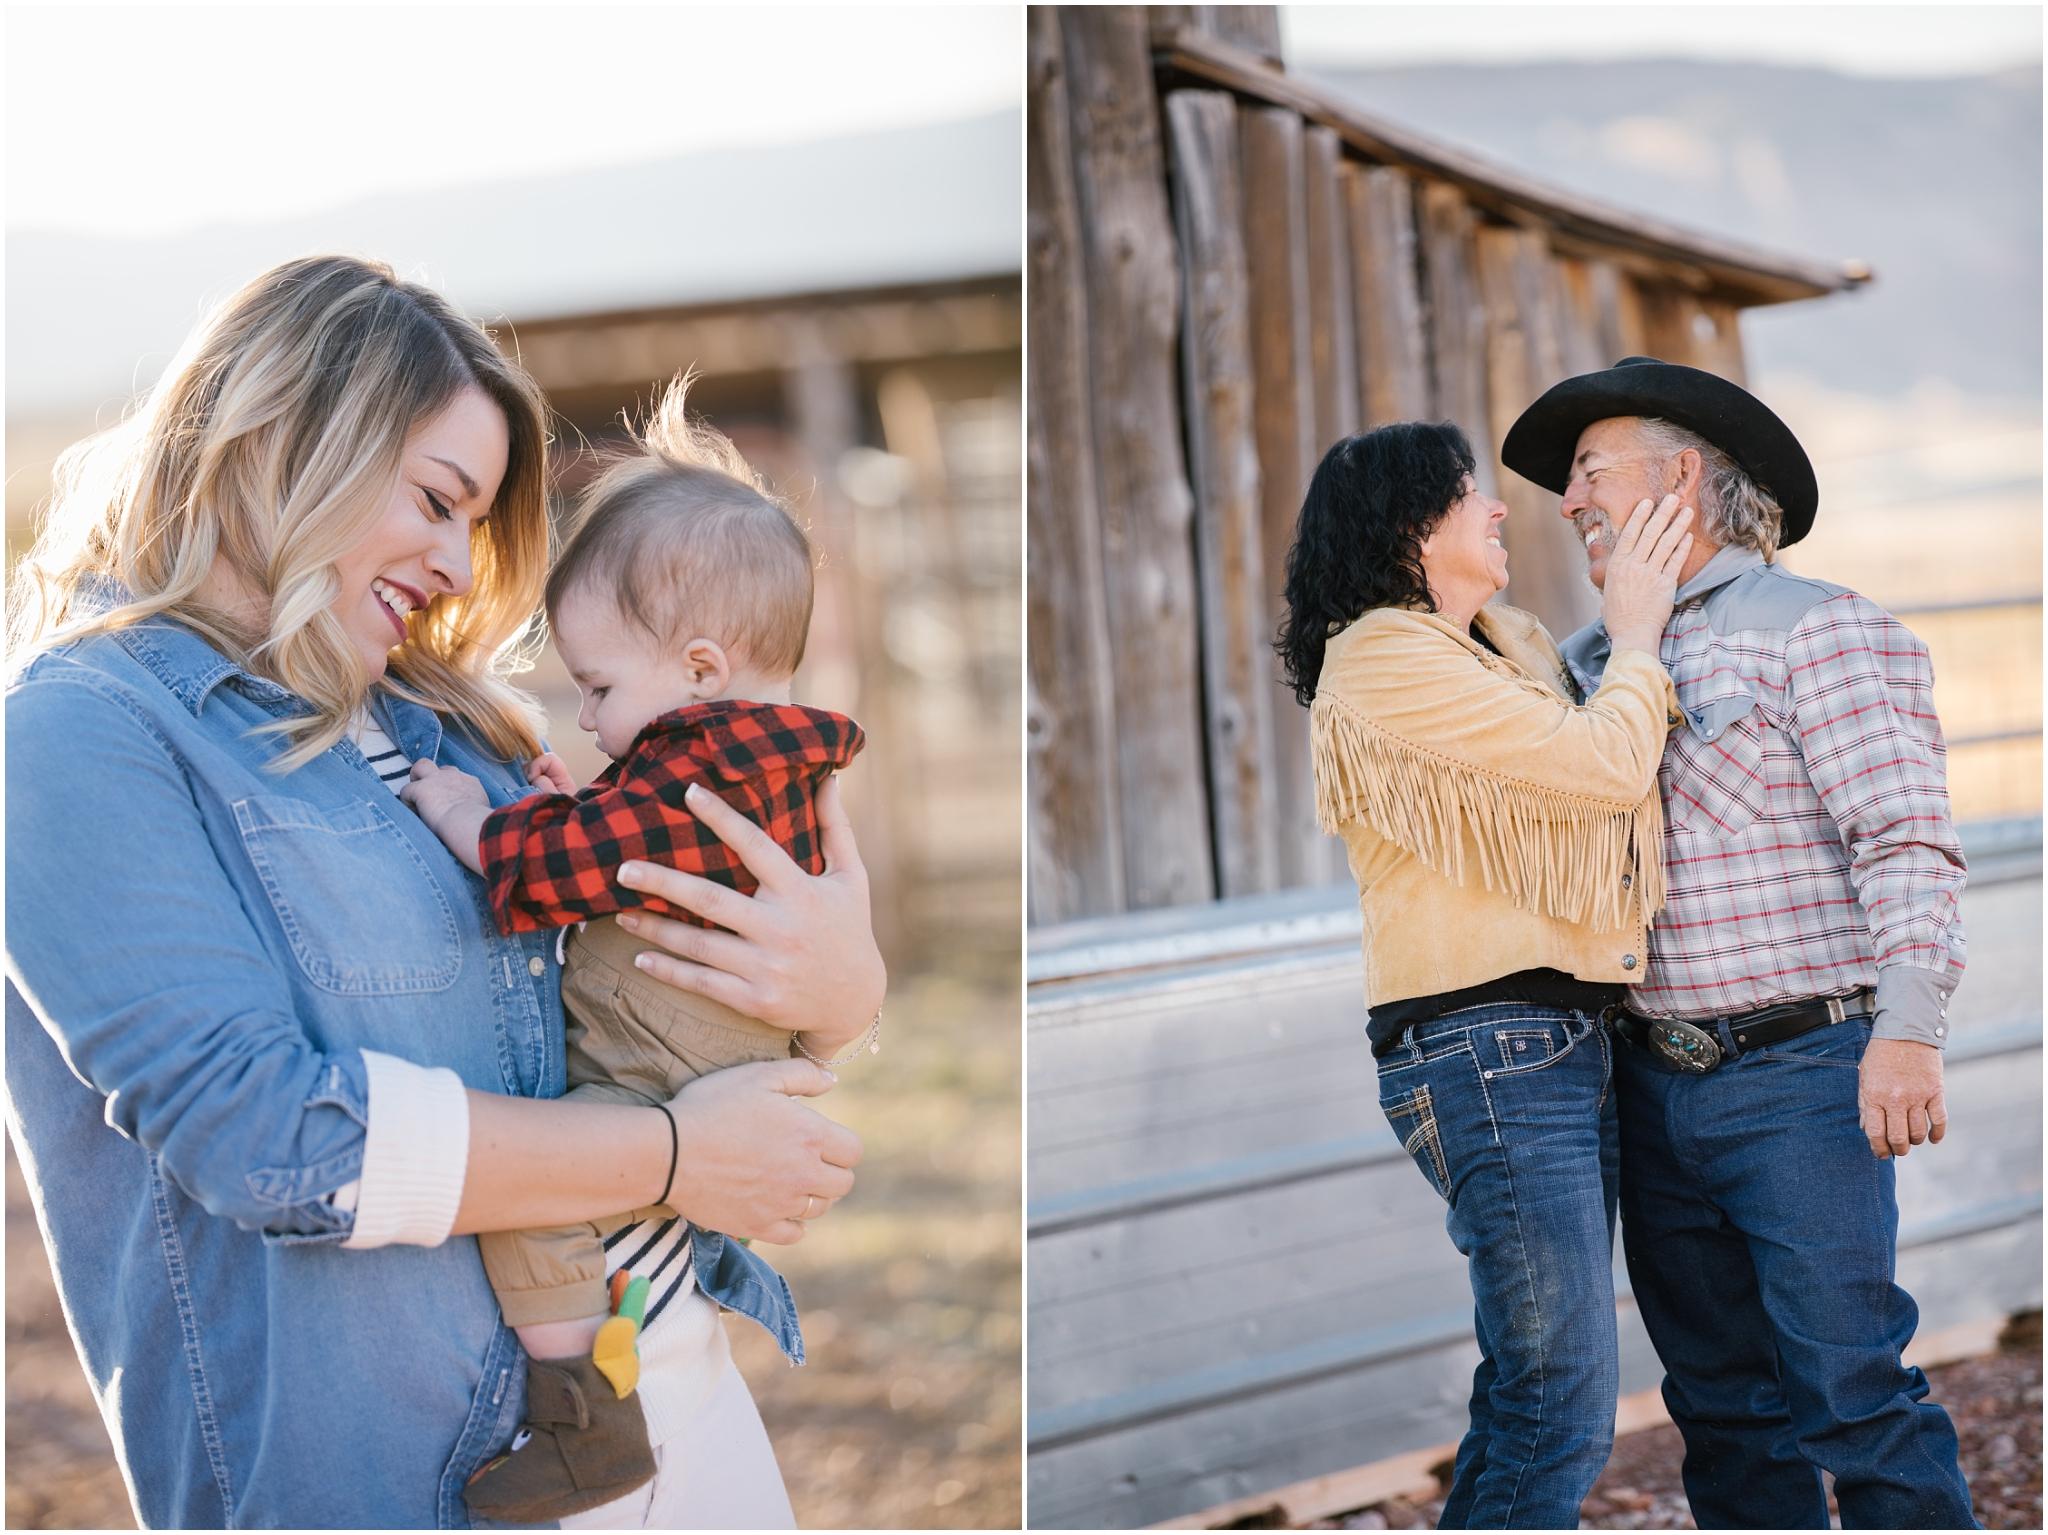 Conrad-98_Lizzie-B-Imagery-Utah-Family-Photographer-Utah-County-Central-Utah-Park-City-Extended-Family-Session.jpg